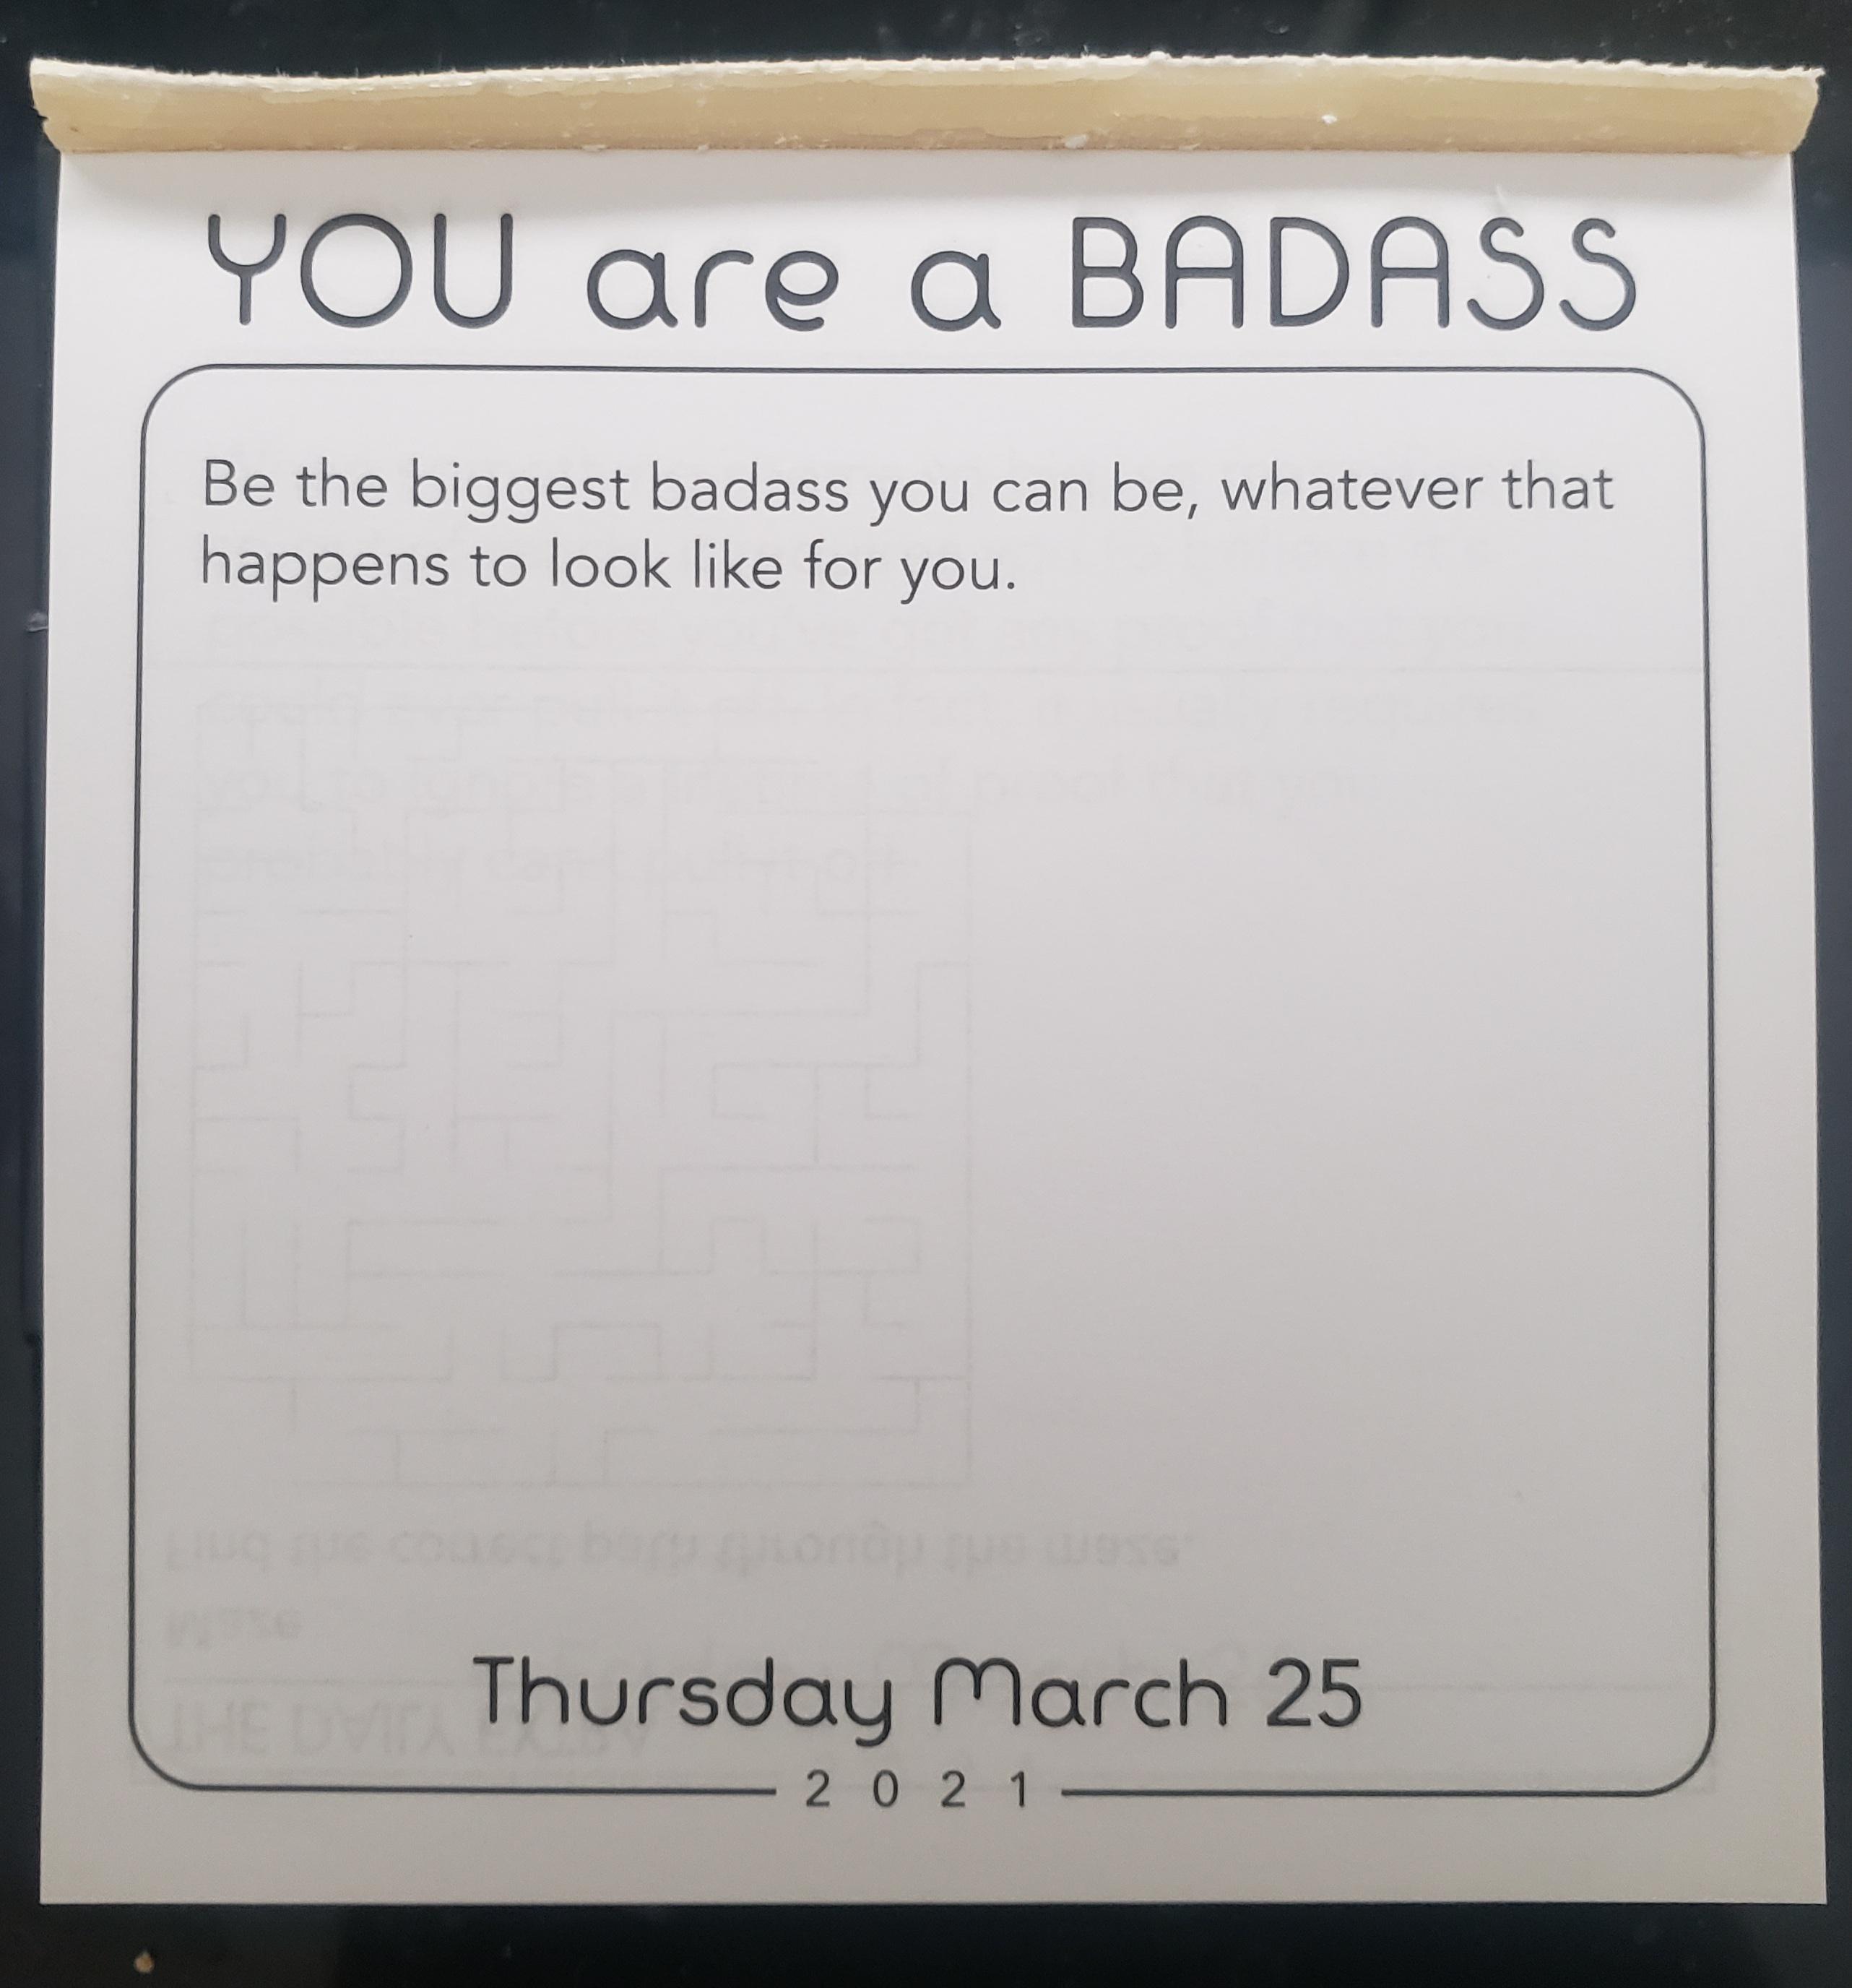 [Image] Thursday Motivation